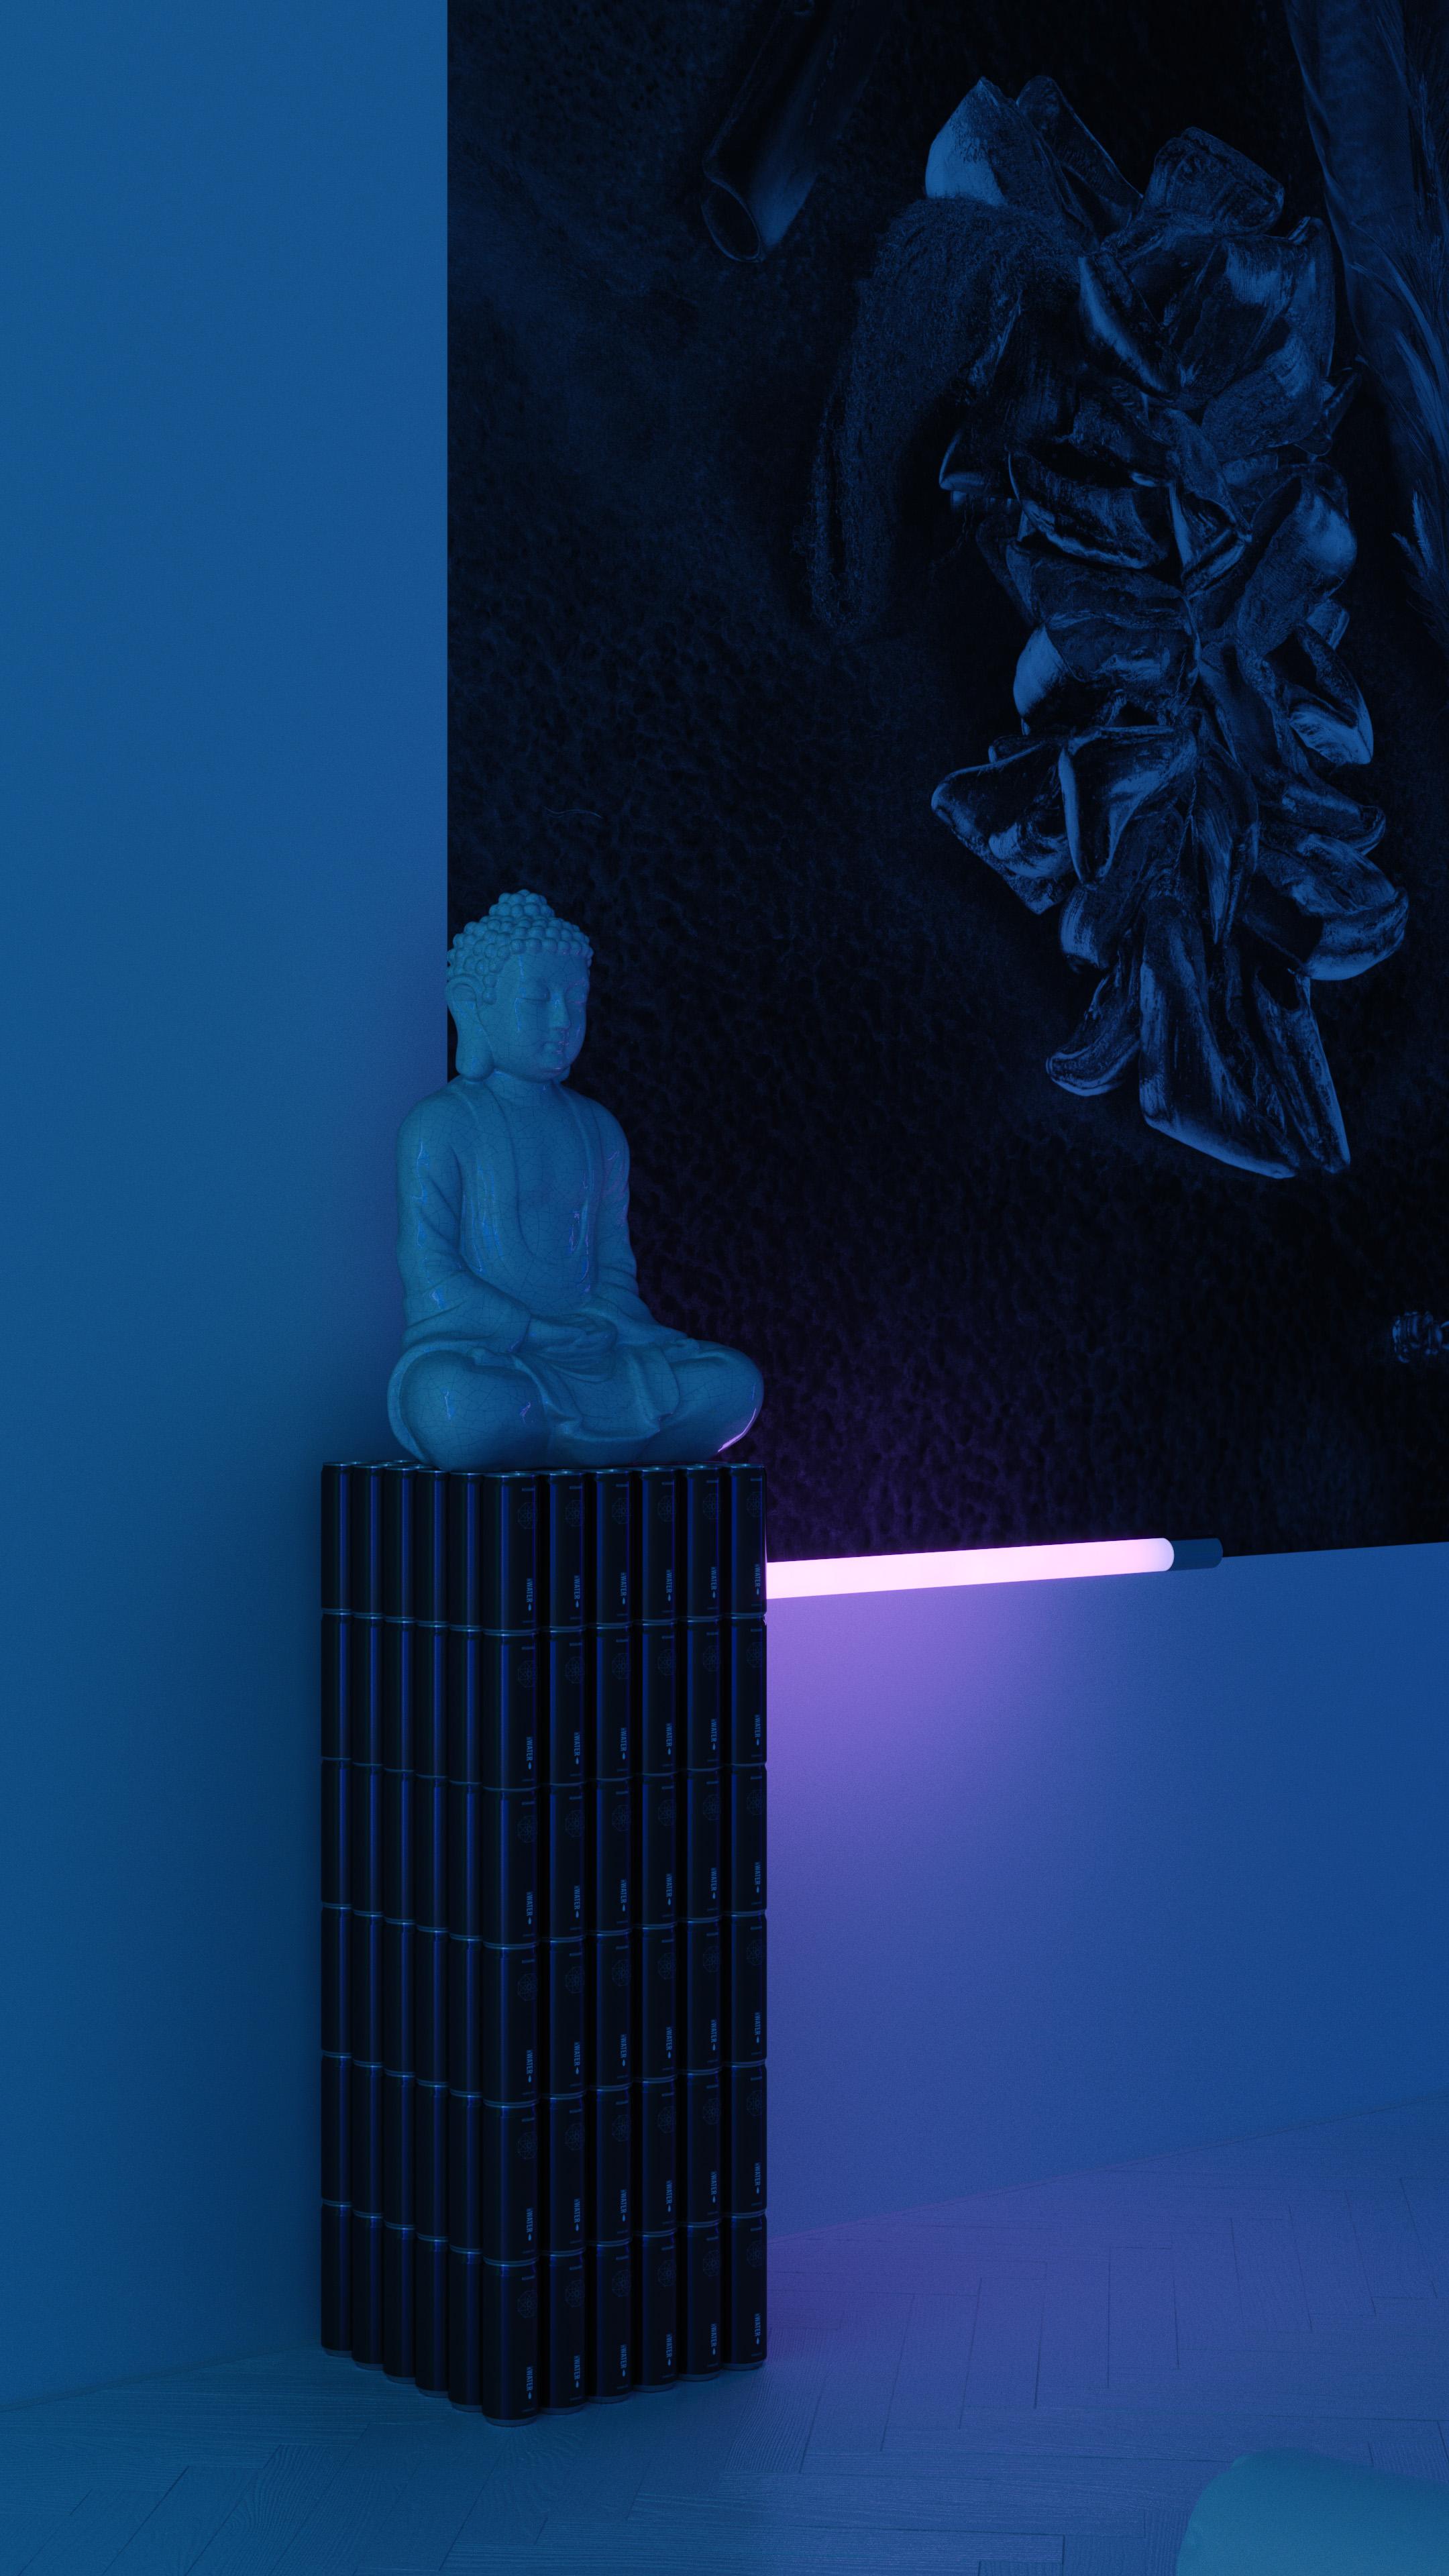 17_09_16_Buddha_0245.jpg